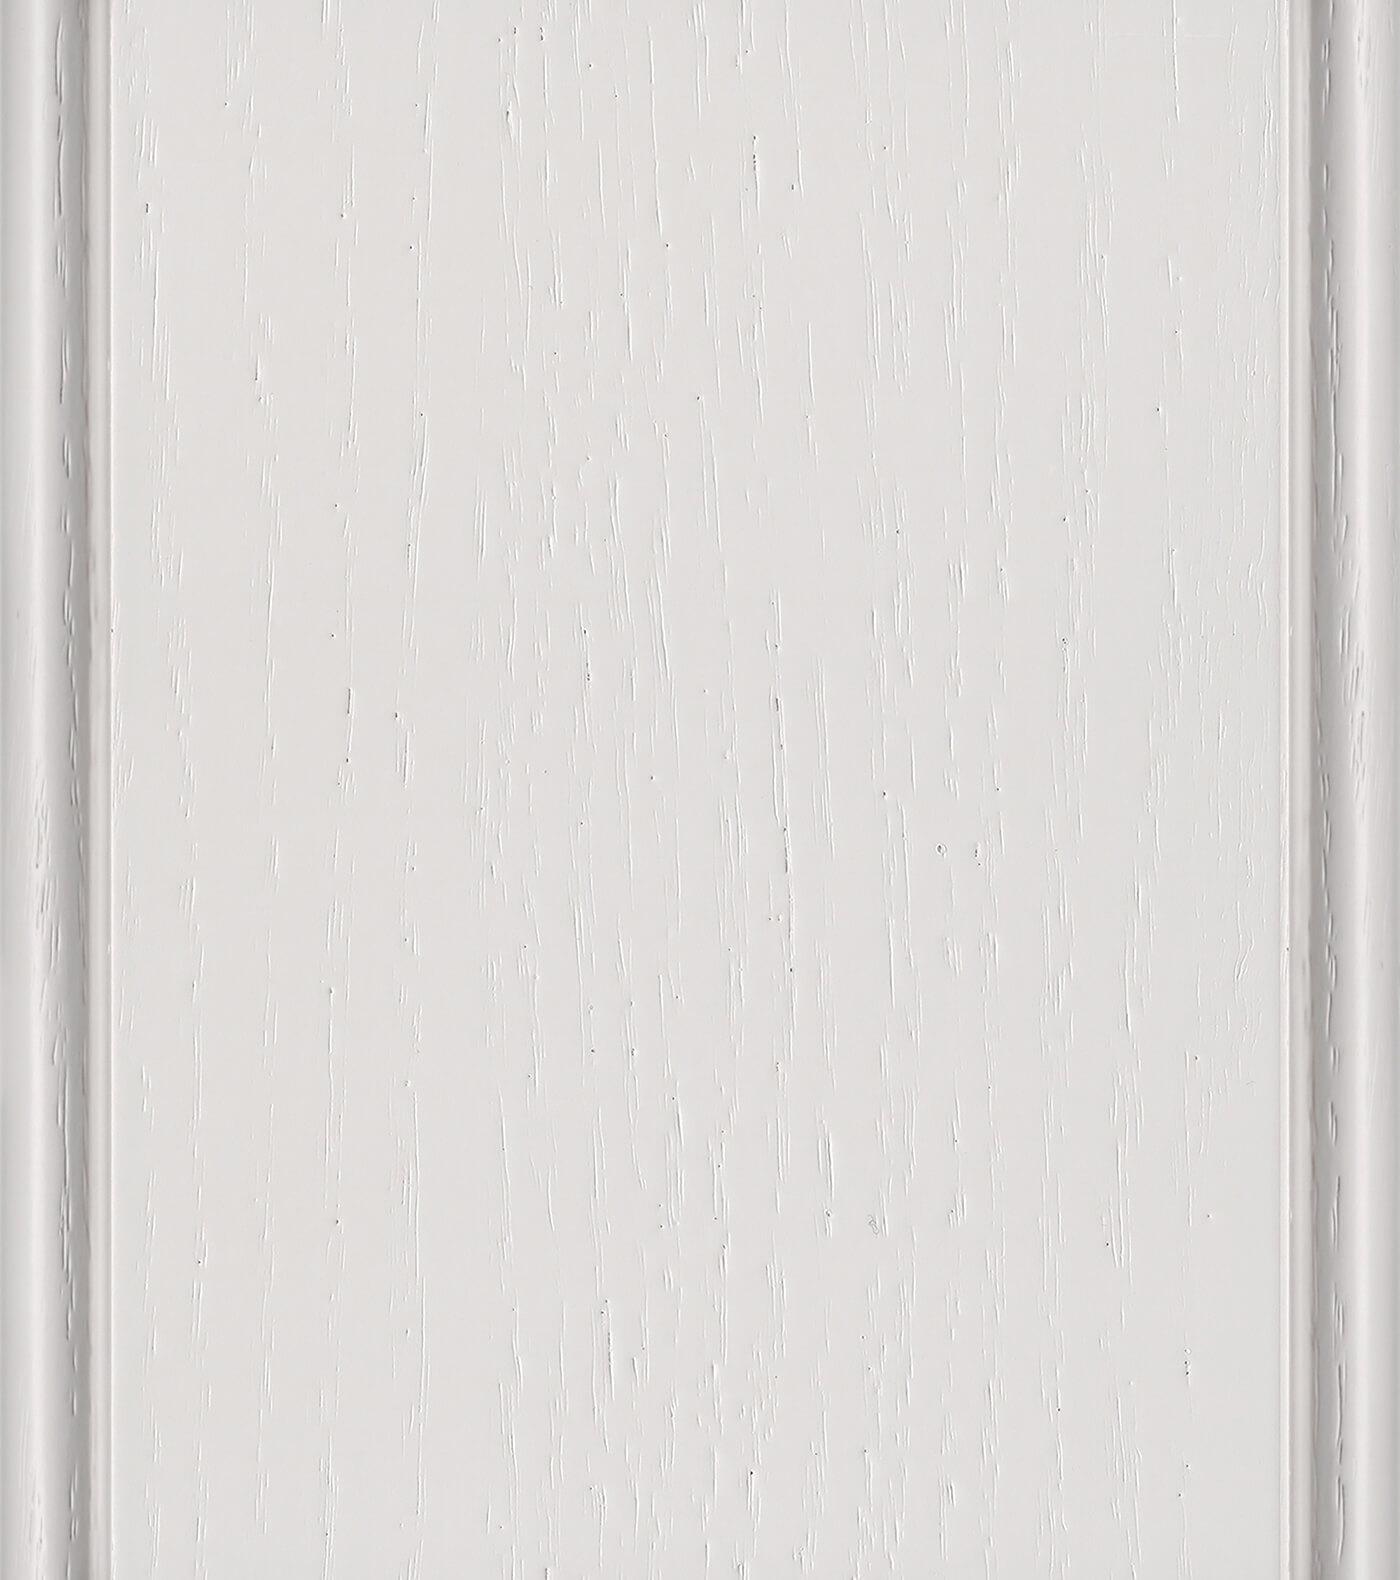 Pearl Paint on Red Oak or Quarter-Sawn Red Oak